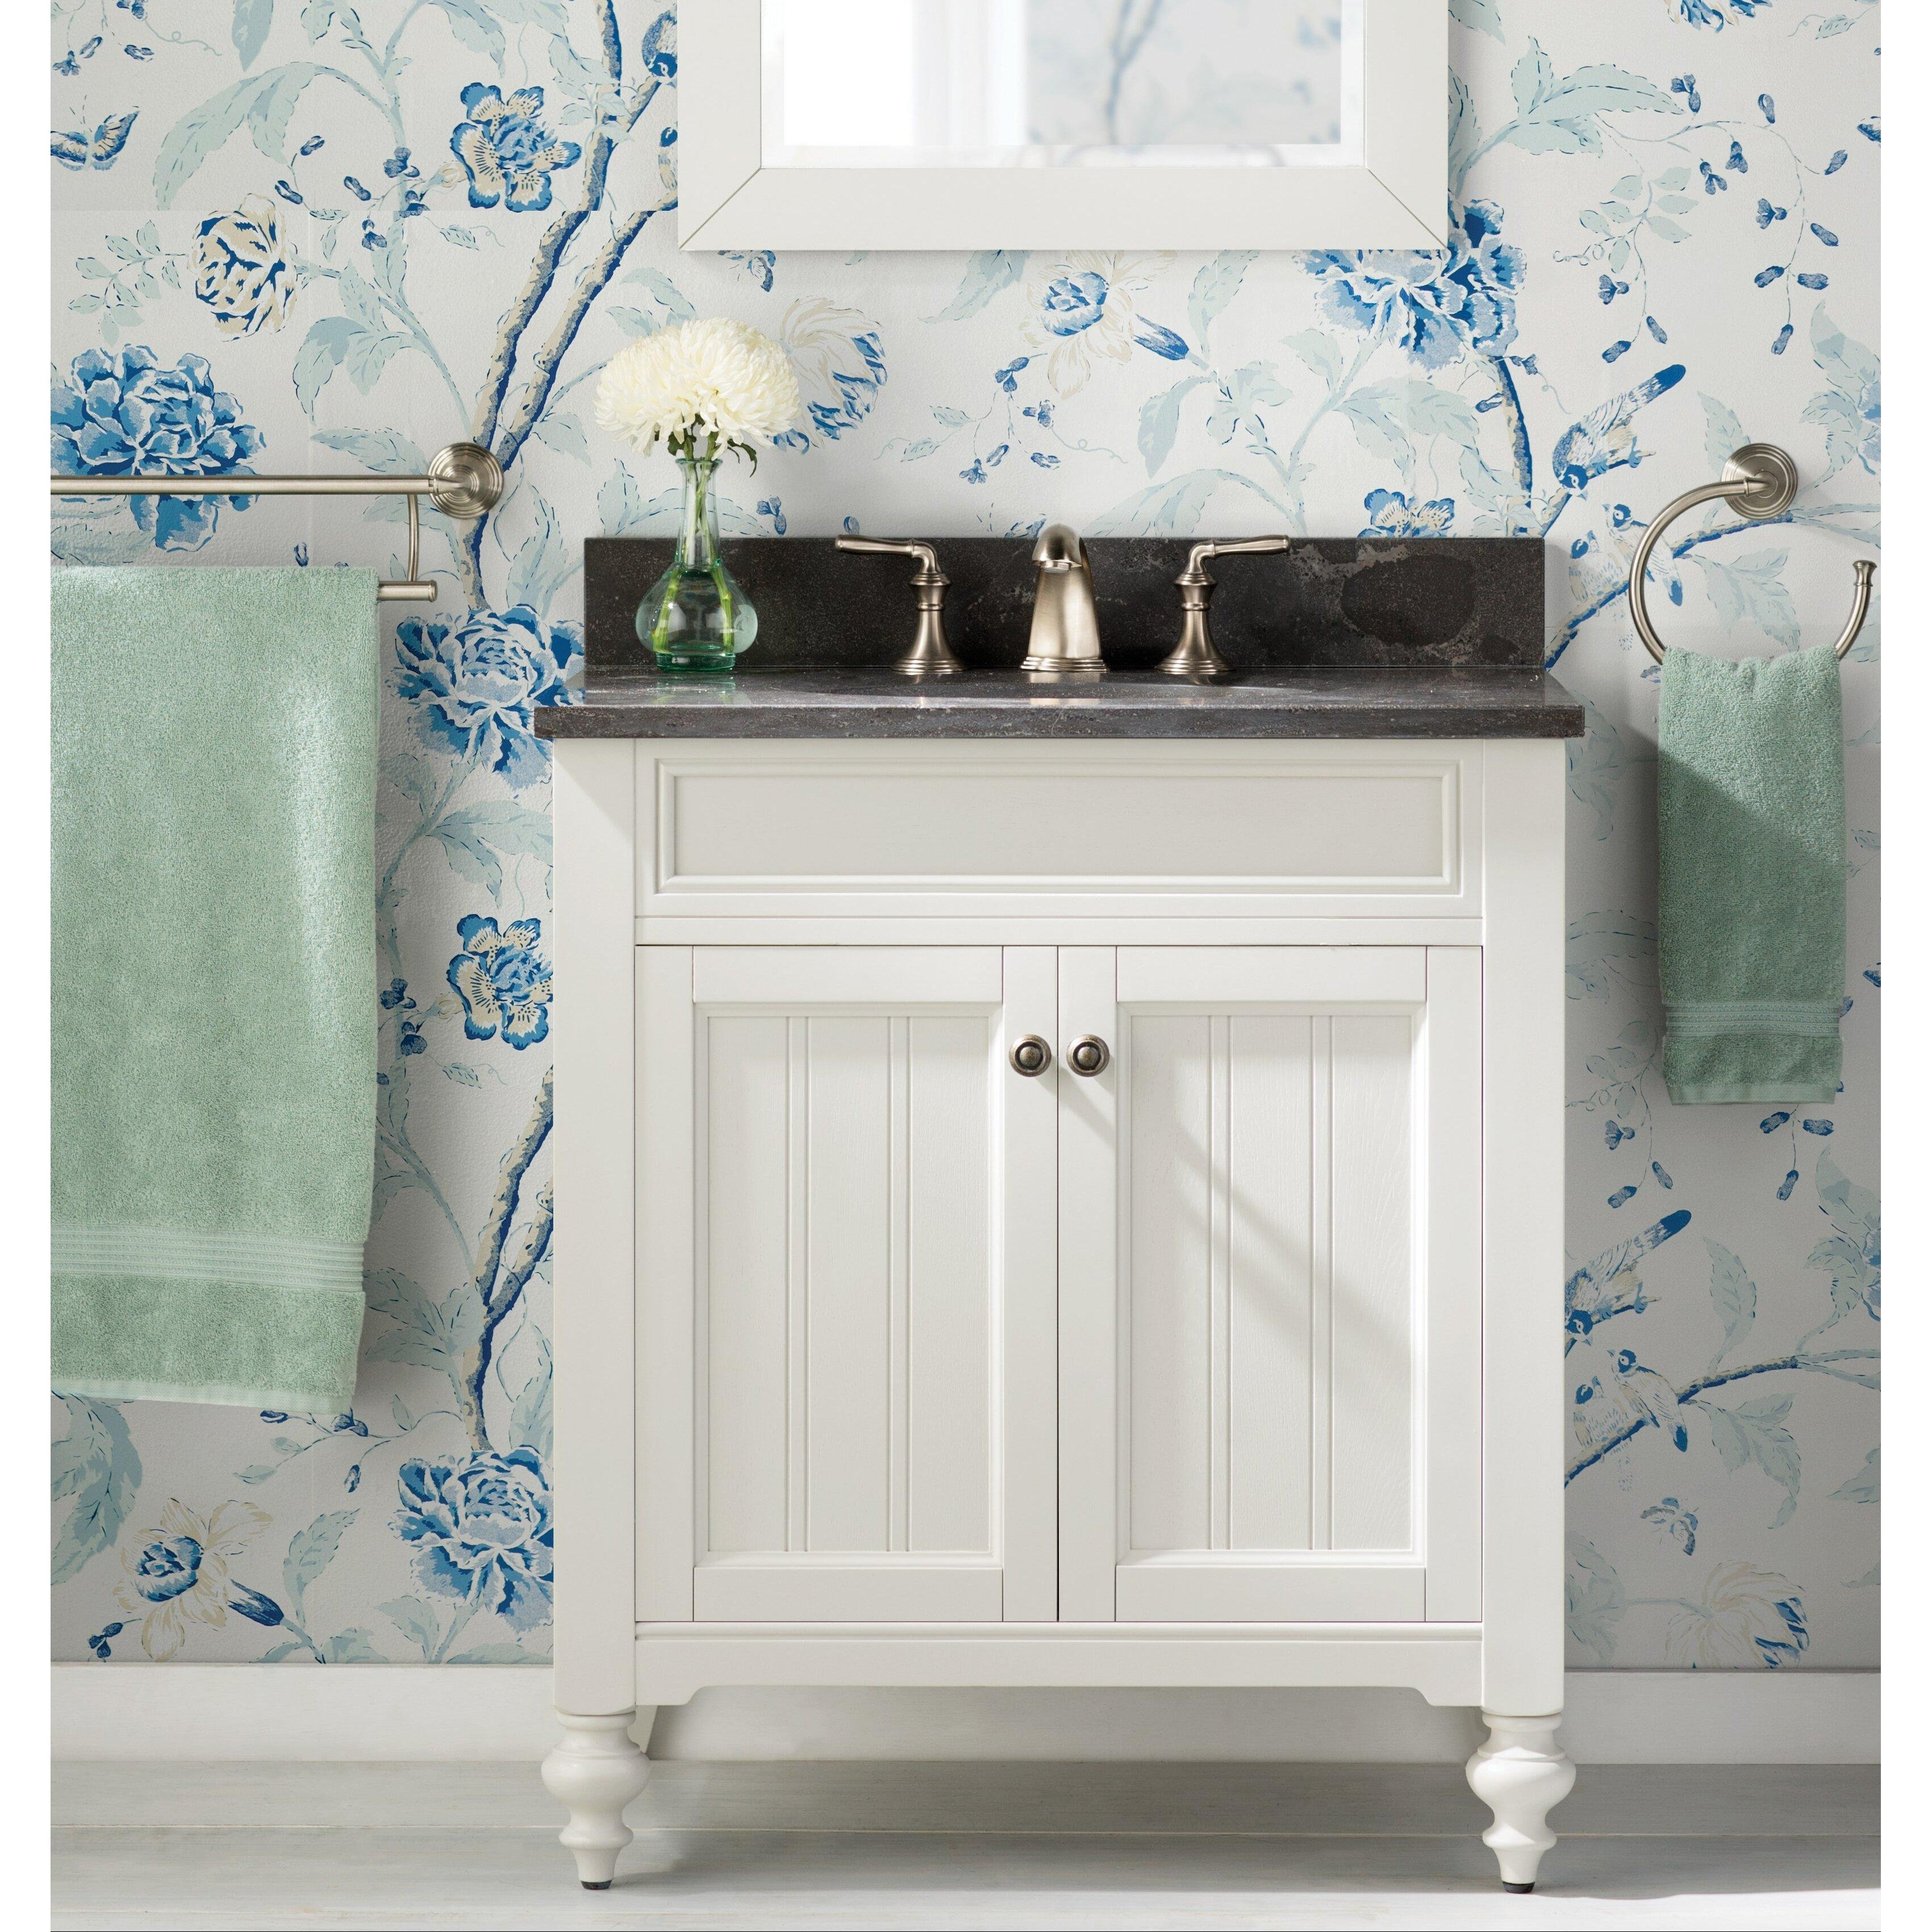 Kohler Bathroom Appliances Bathroom Design Concept